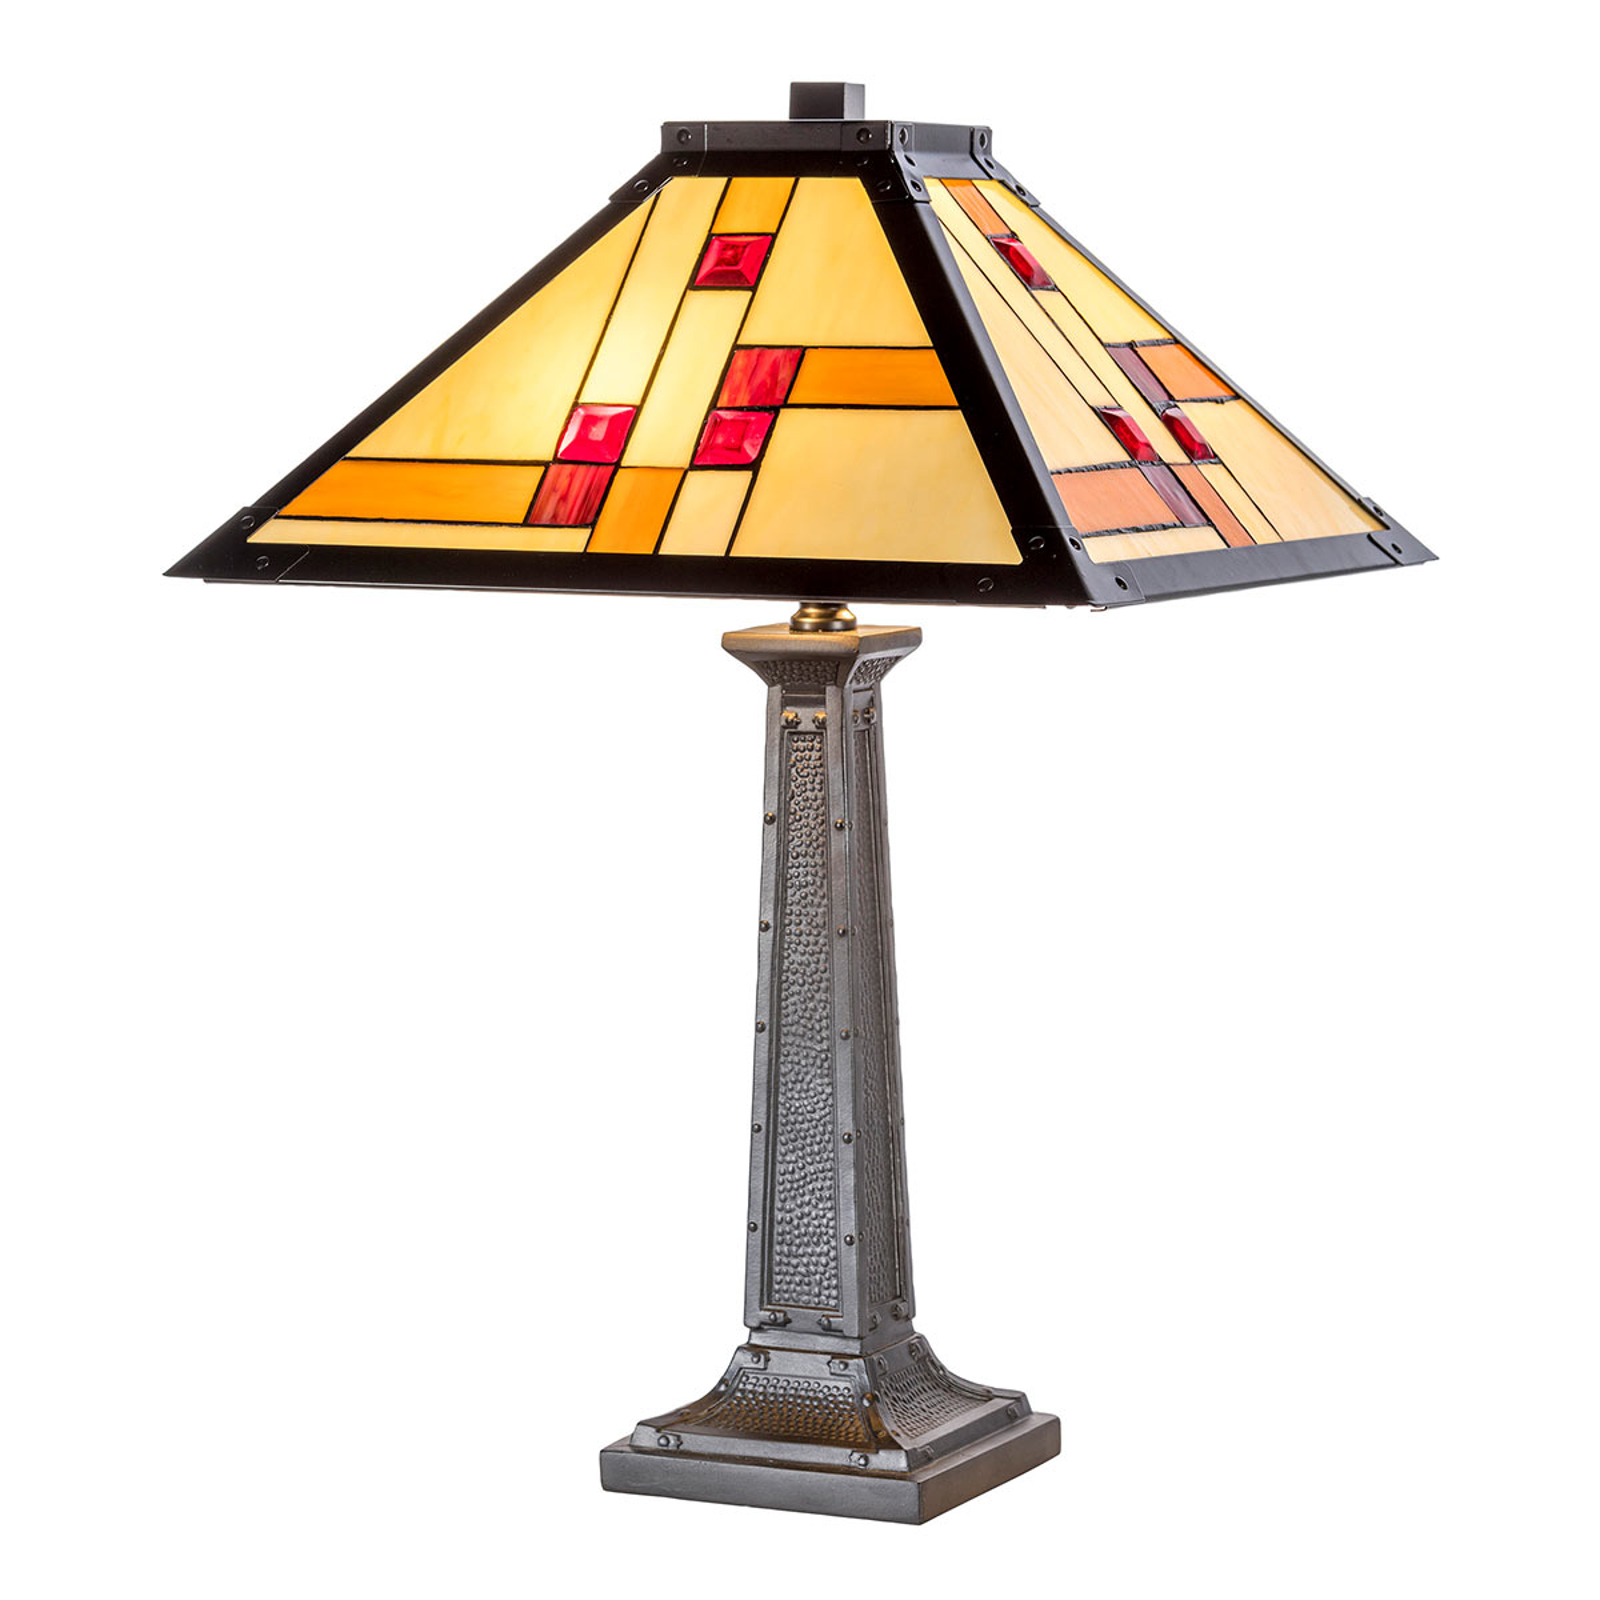 Tafellamp KT1836-40+P1836 in Tiffany stijl